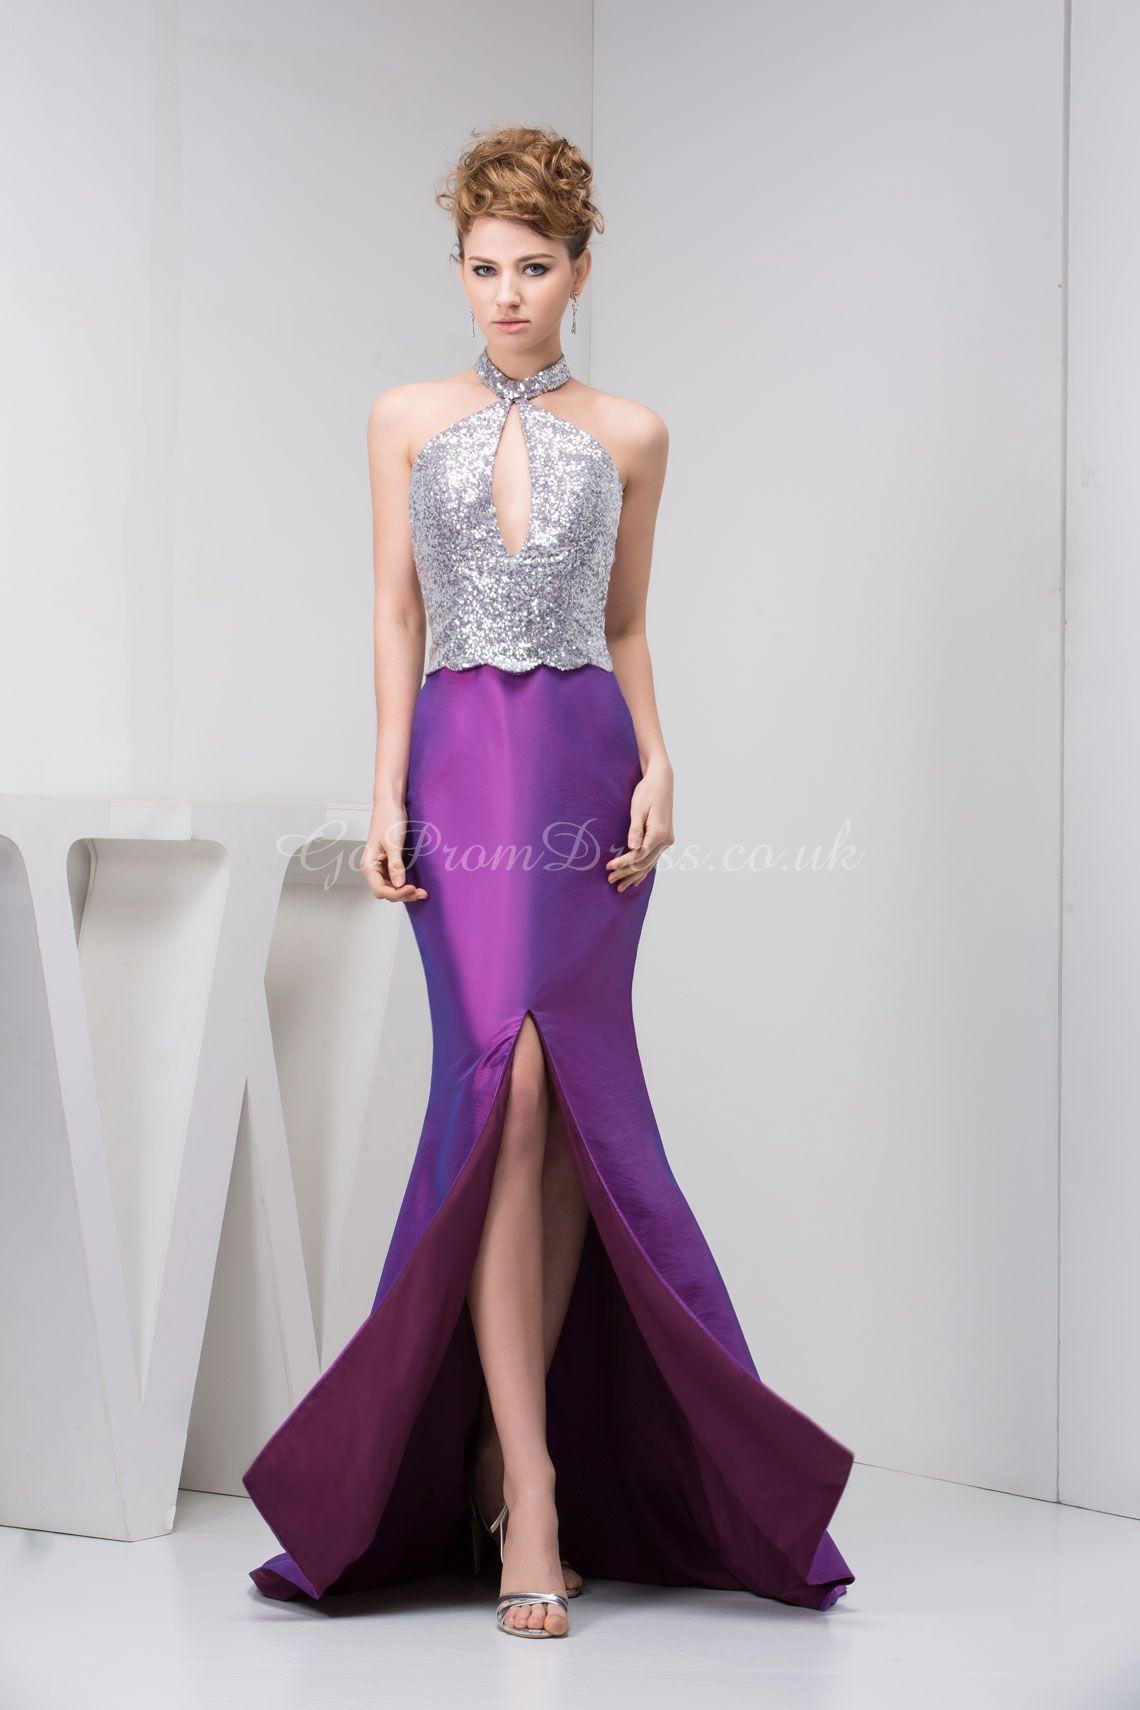 Prom dressprom dressesprom dressprom dresses mermaidtrumpet